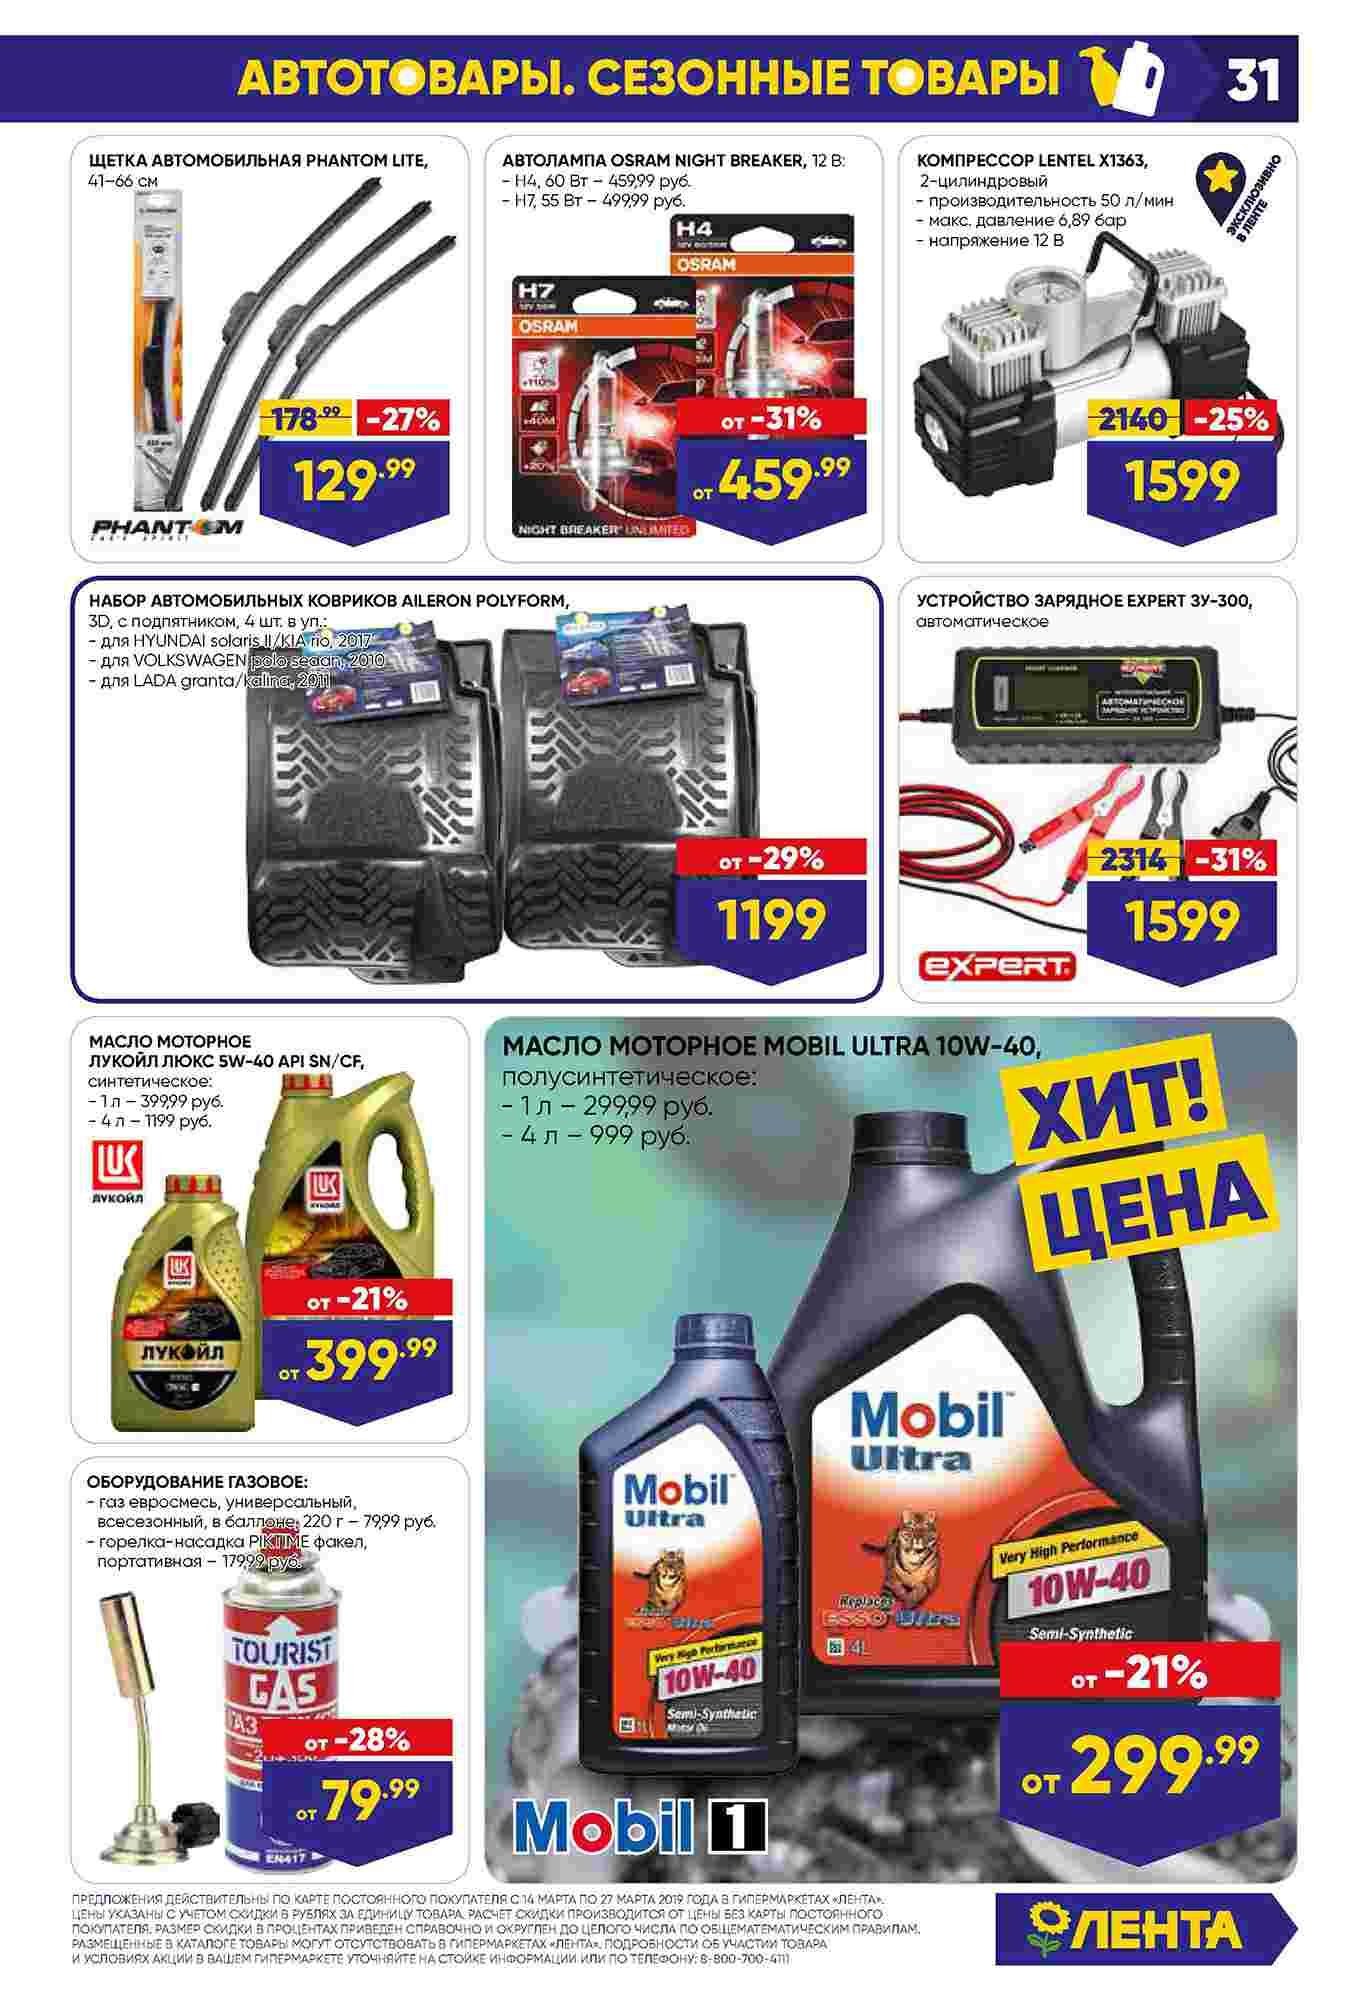 Каталог Лента гипермаркет 14-27.03.2019 стр. - 0001 - 0031